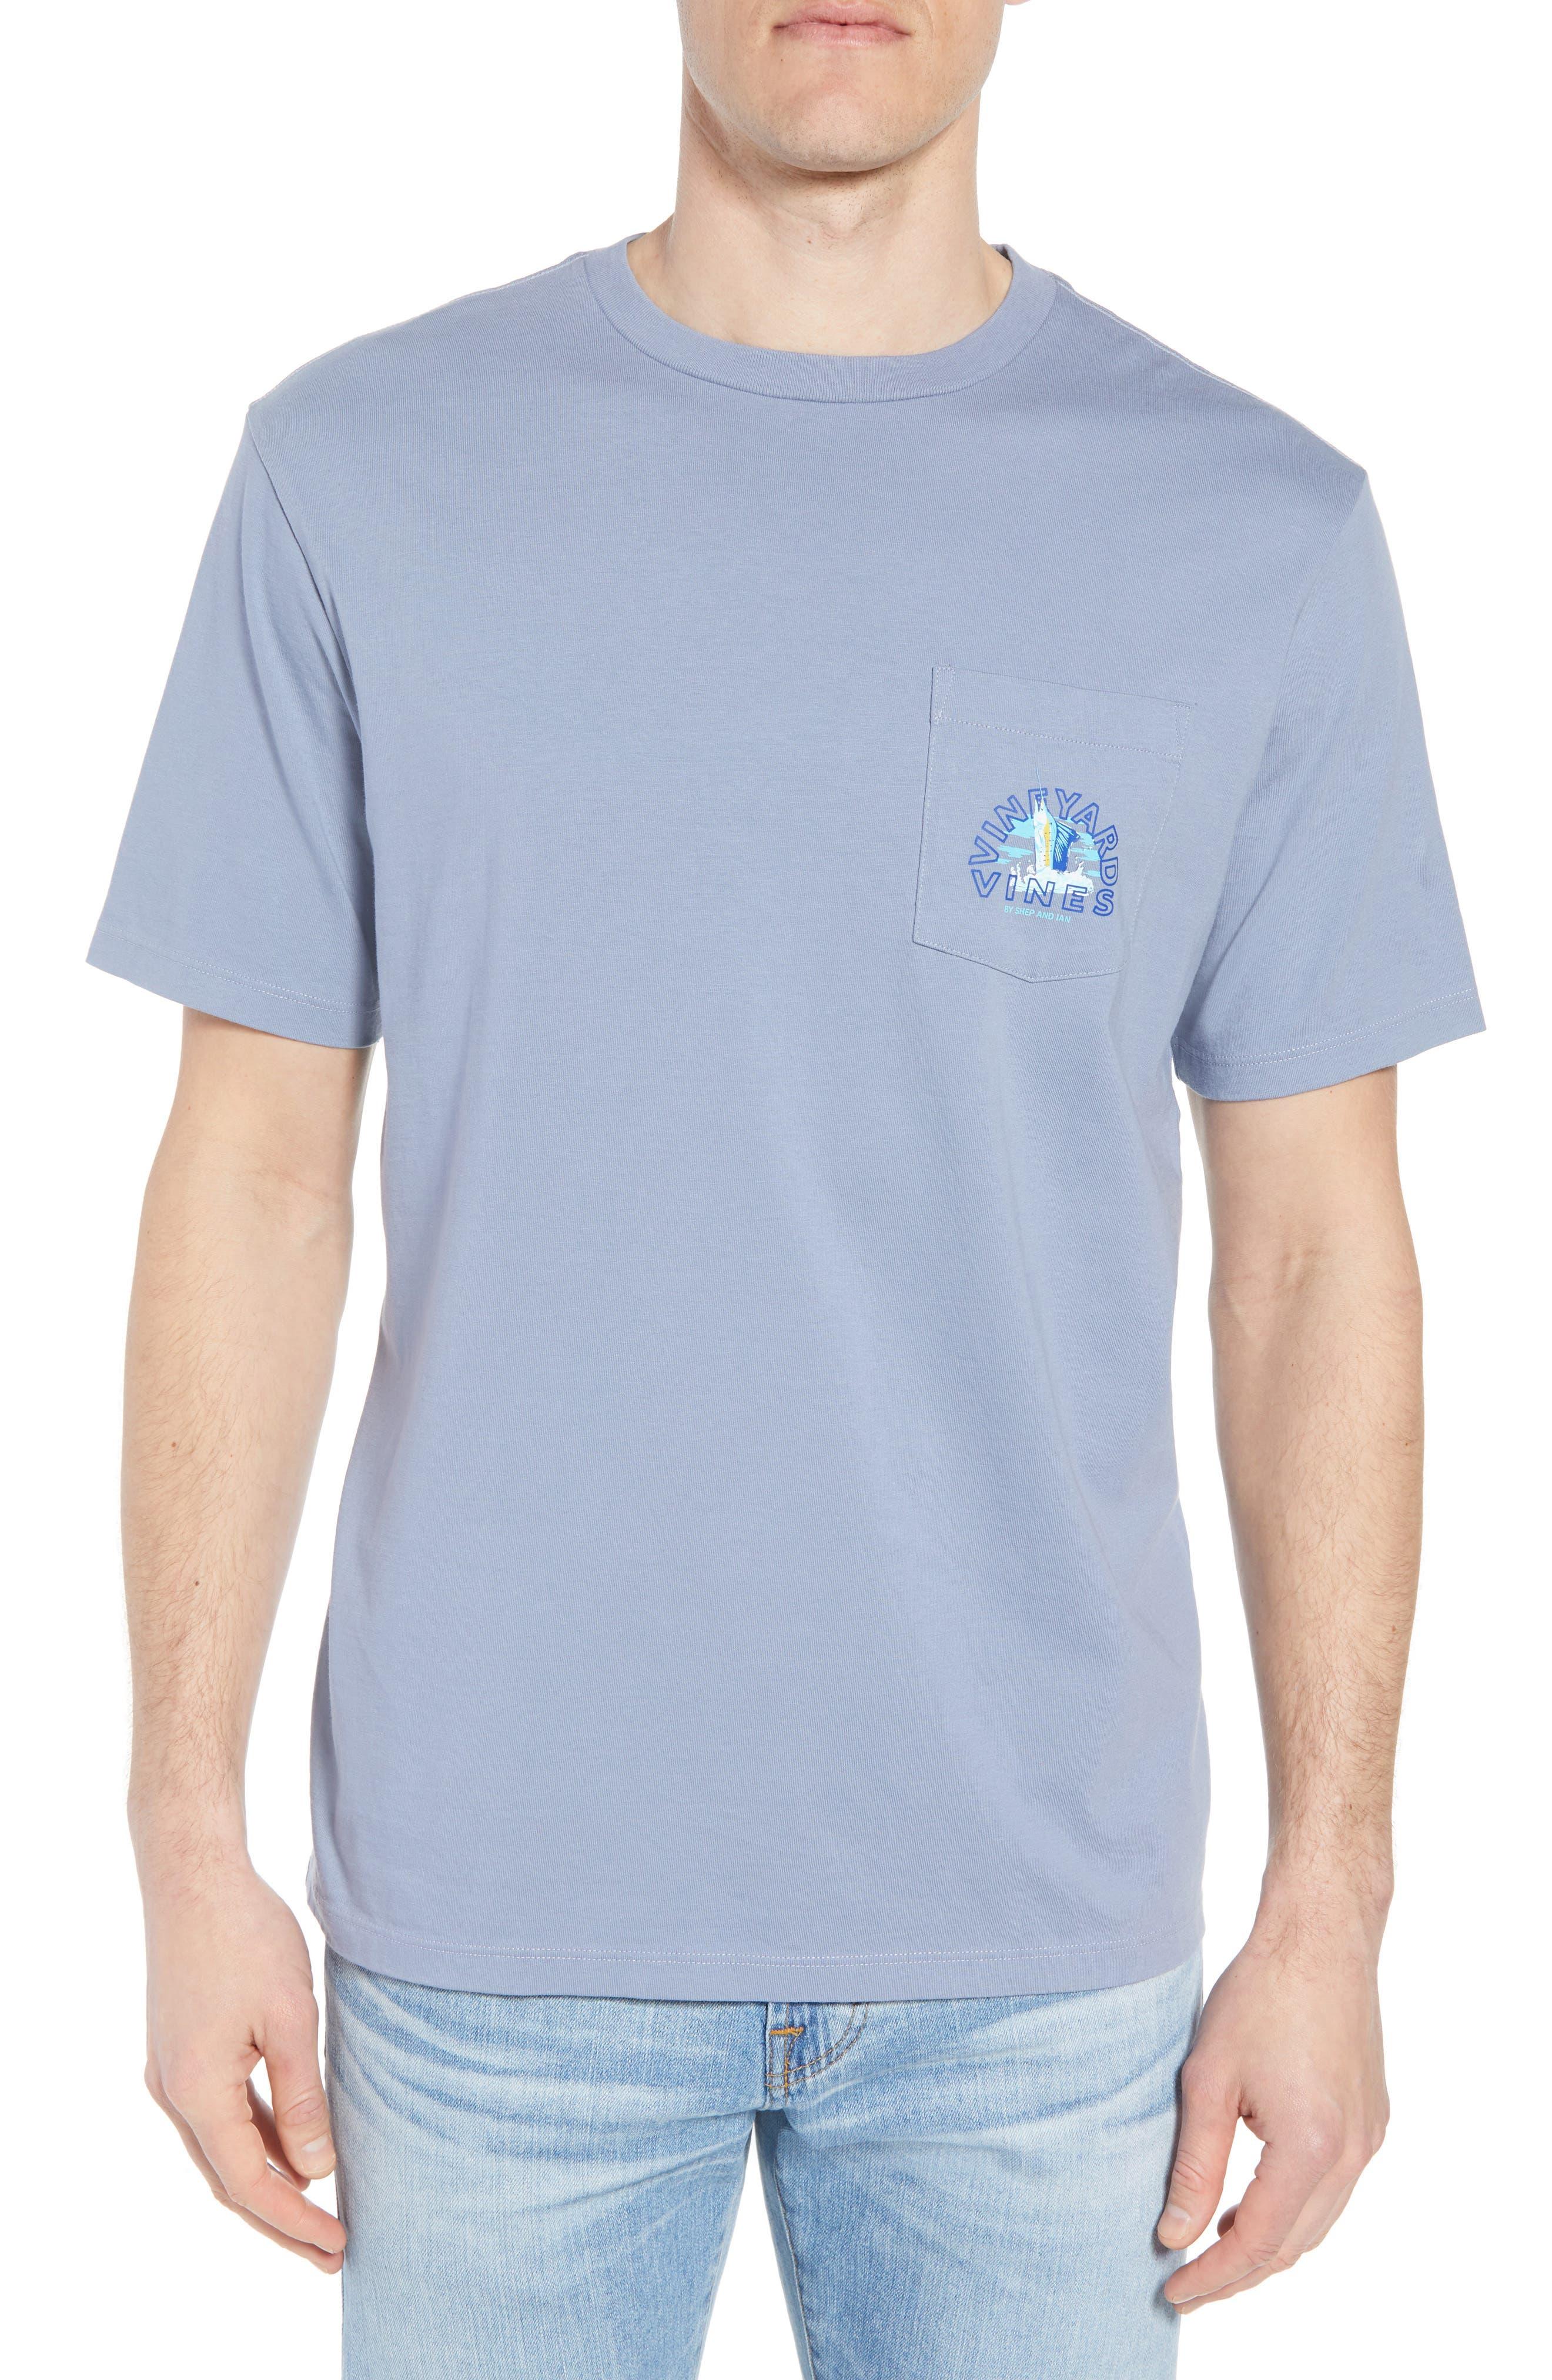 Casting Call Crewneck T-Shirt,                             Main thumbnail 1, color,                             411